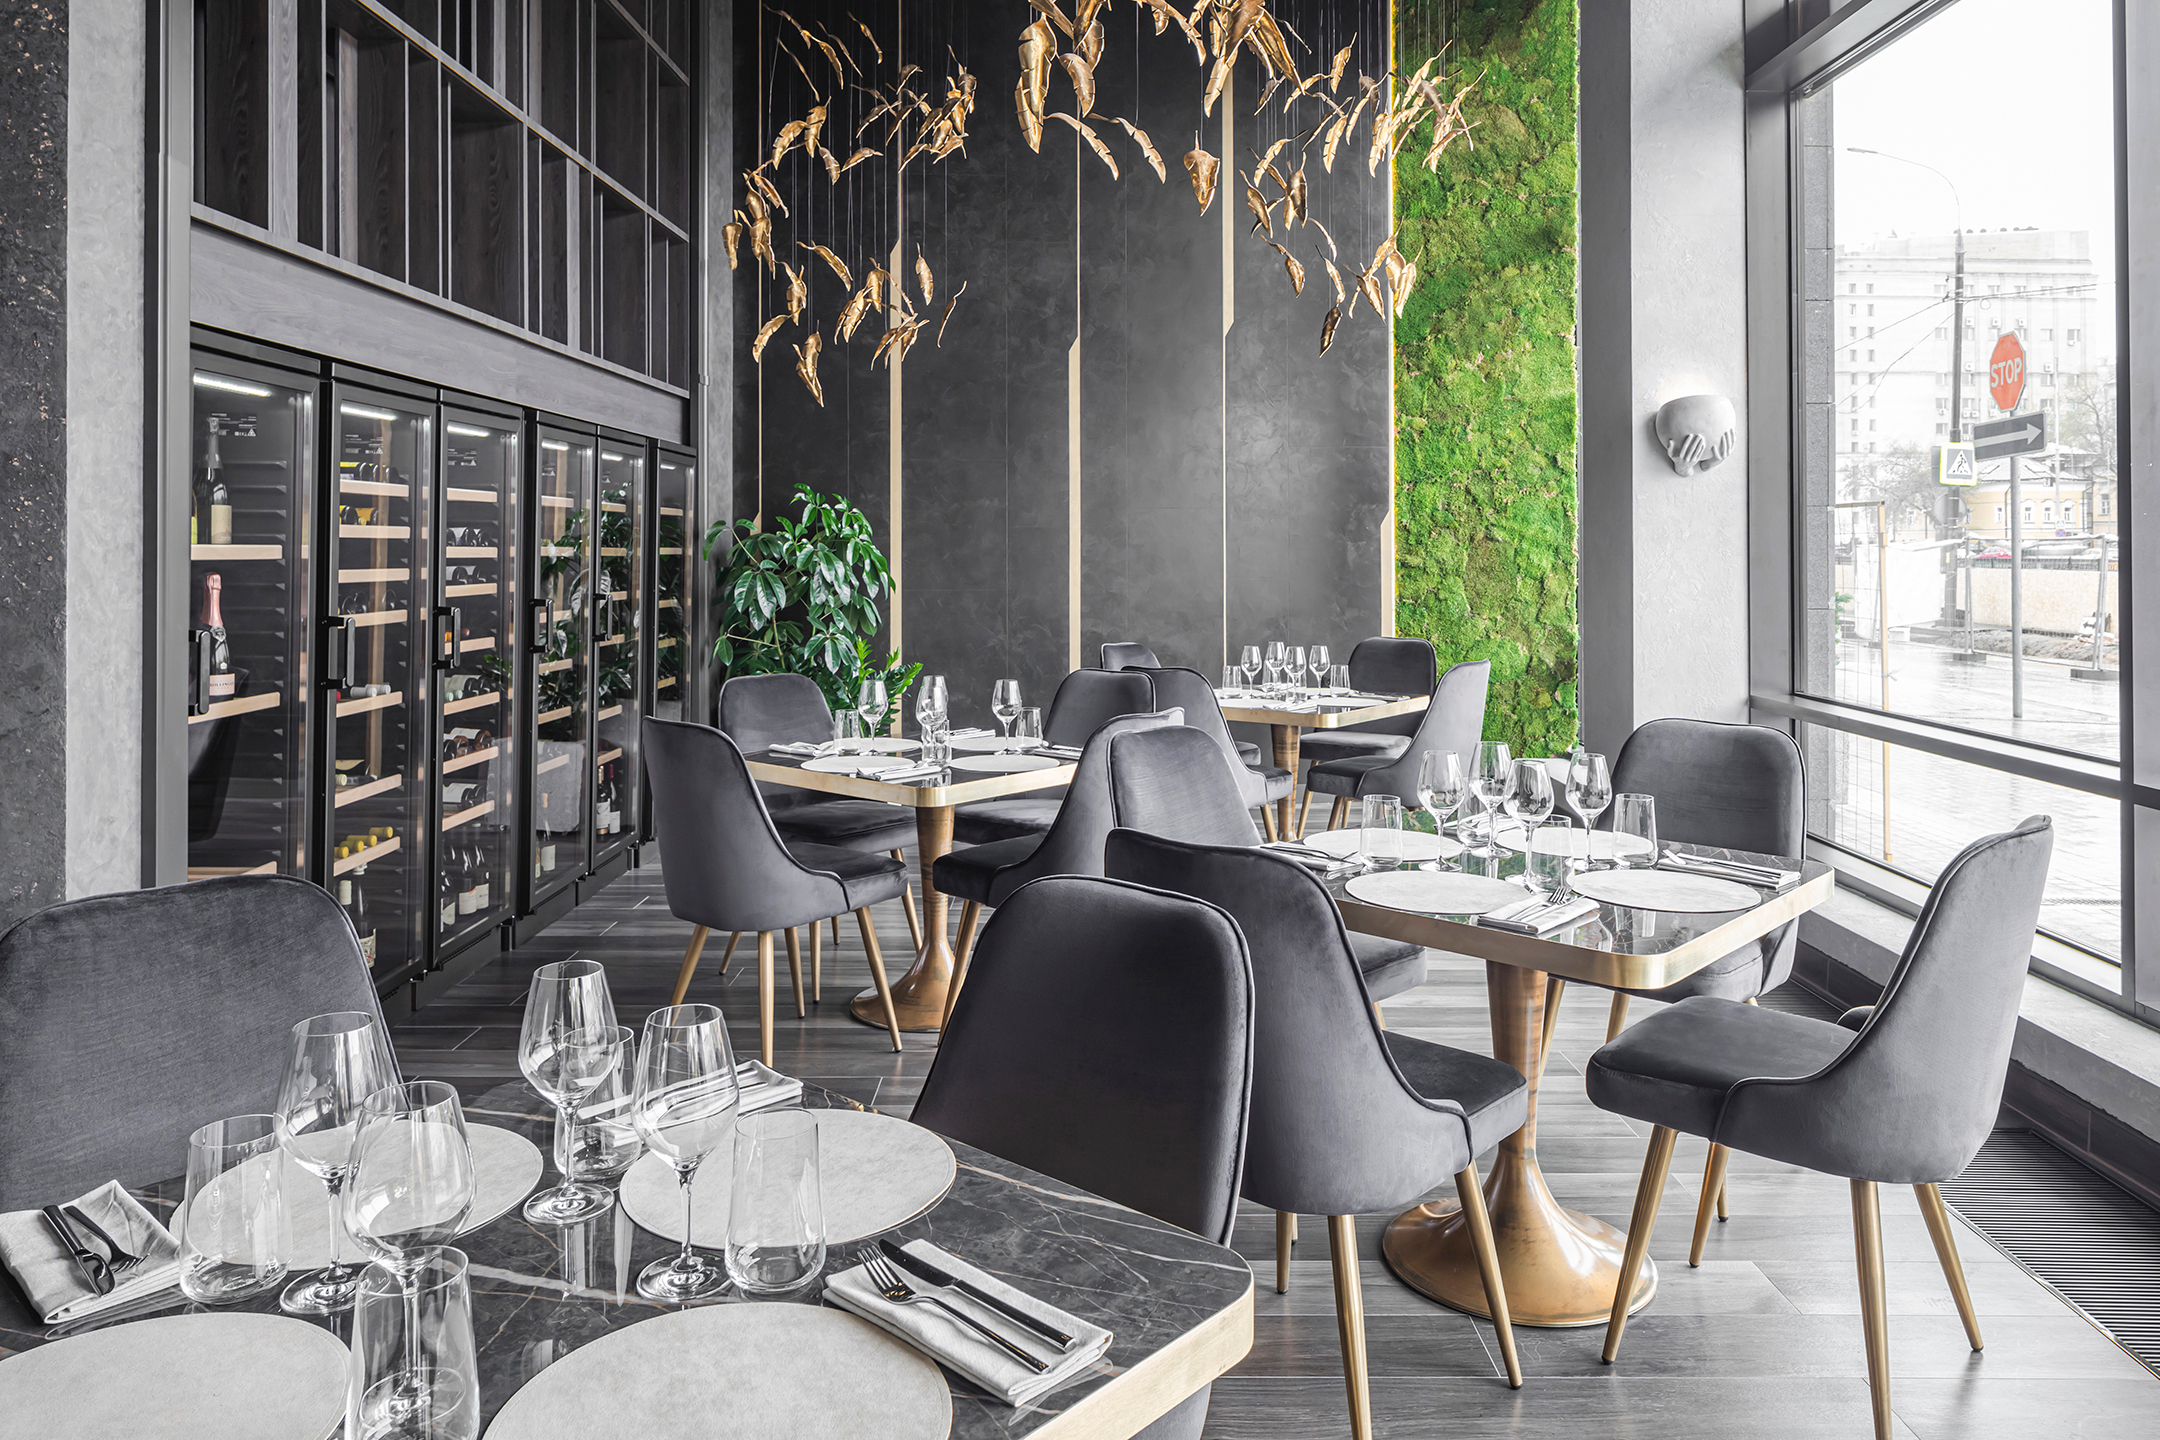 Добавлен Чек Поинт Touch Chef's place & bar